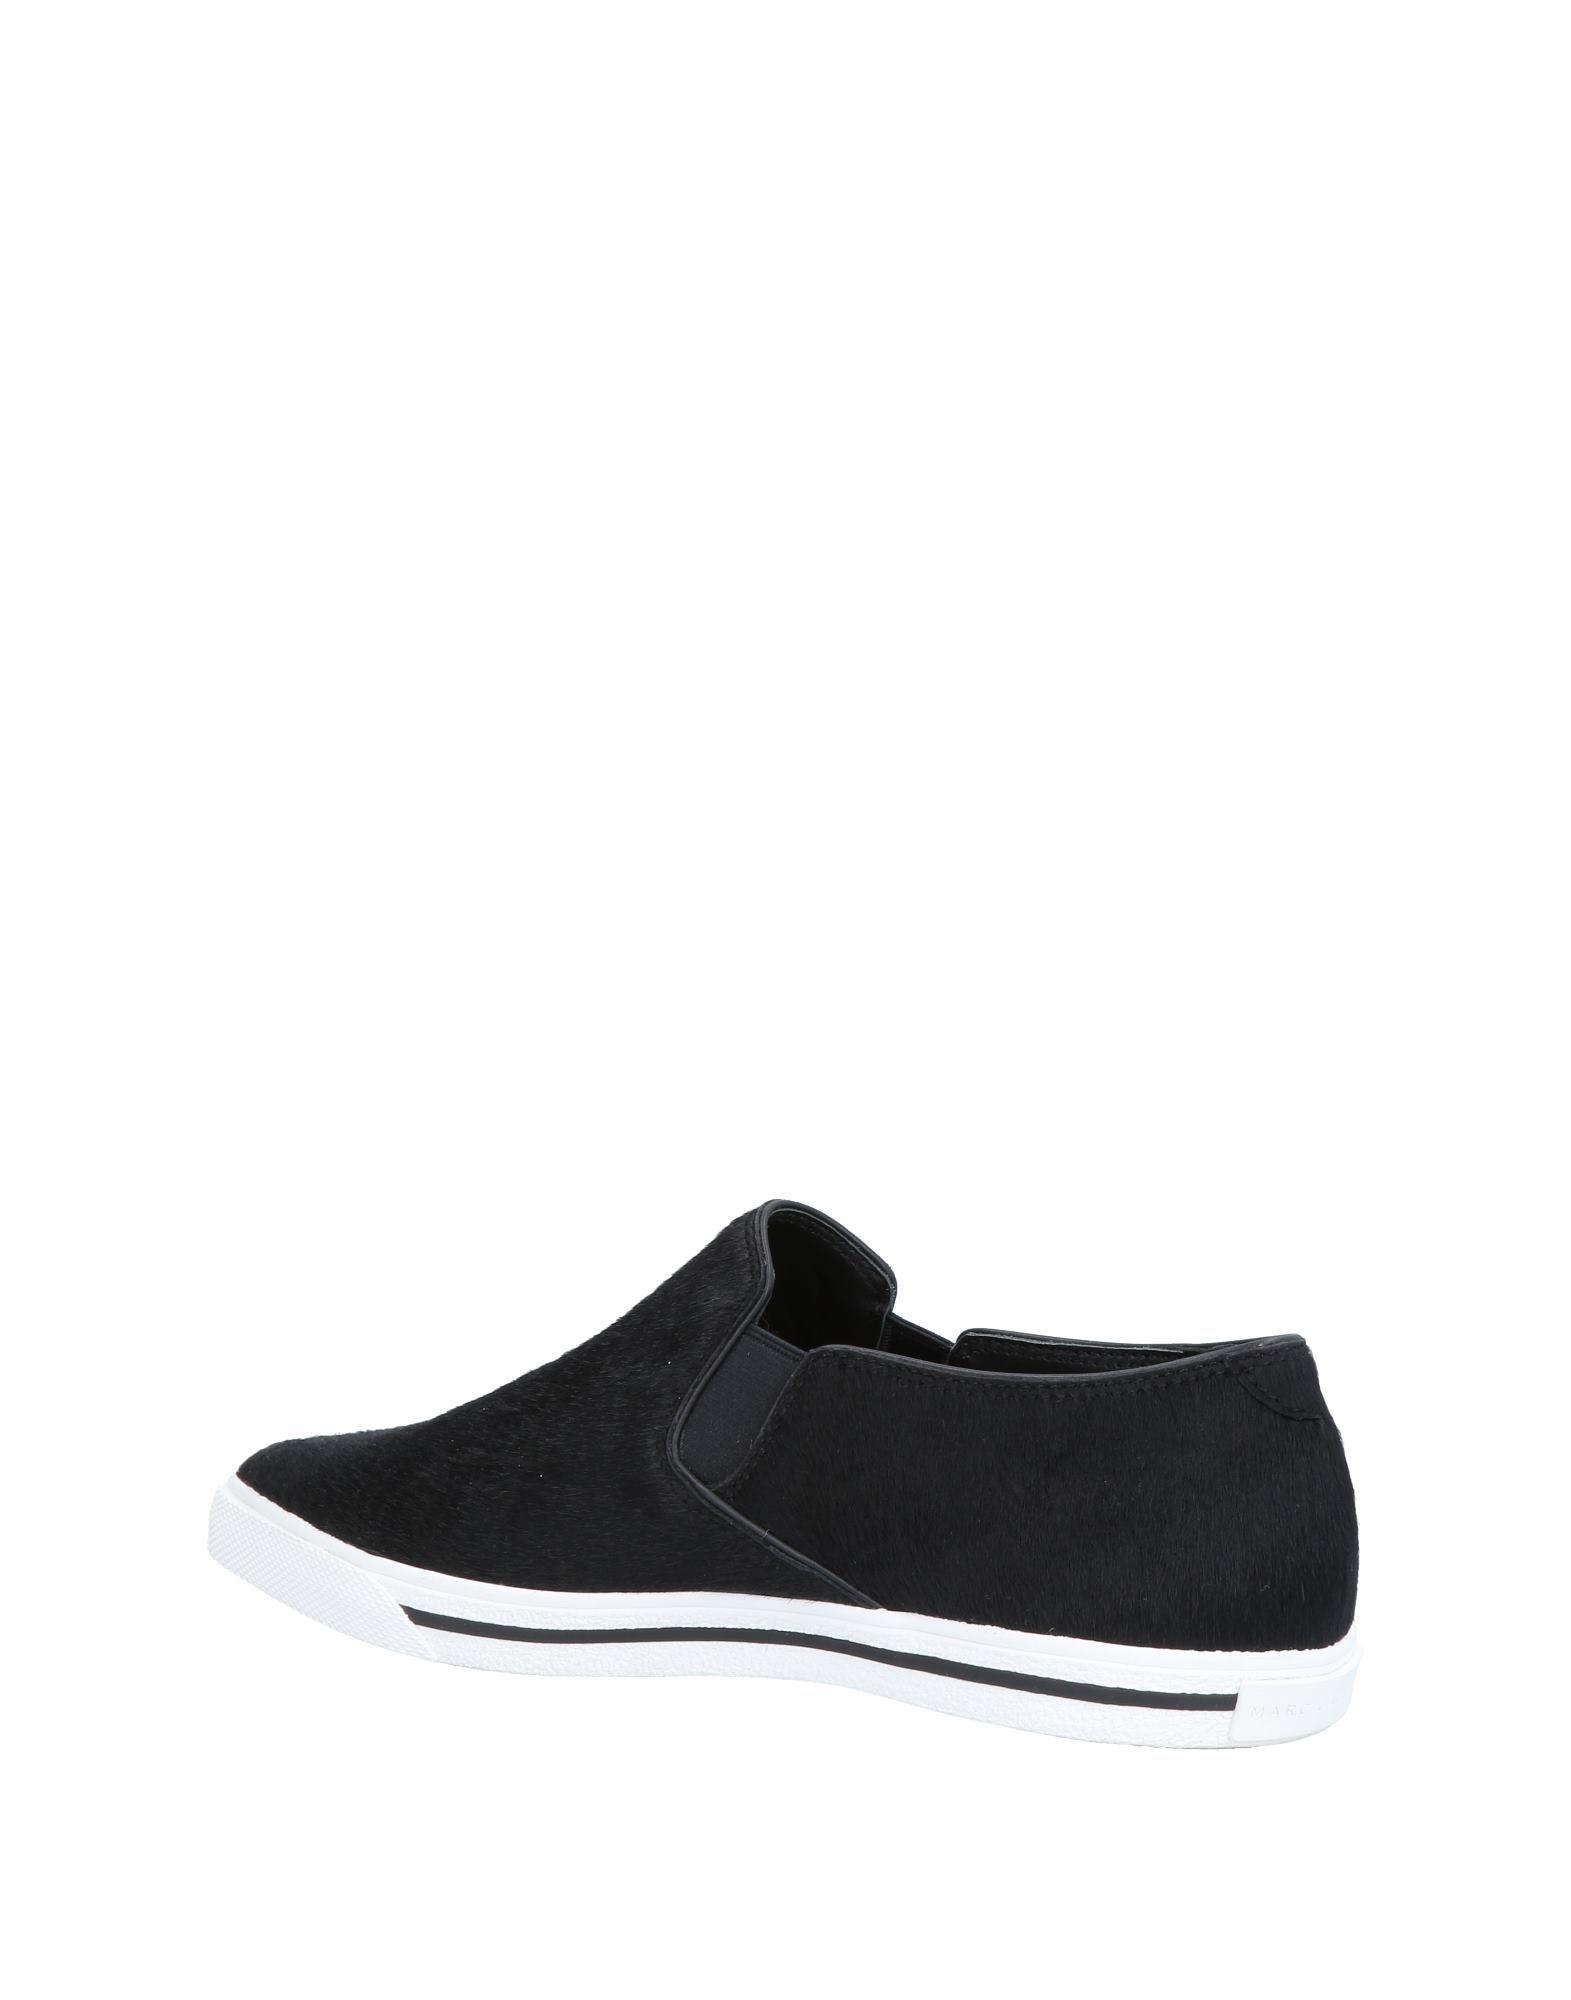 Stilvolle billige Damen Schuhe Marc Jacobs Sneakers Damen billige  11486627UU a7a4d3